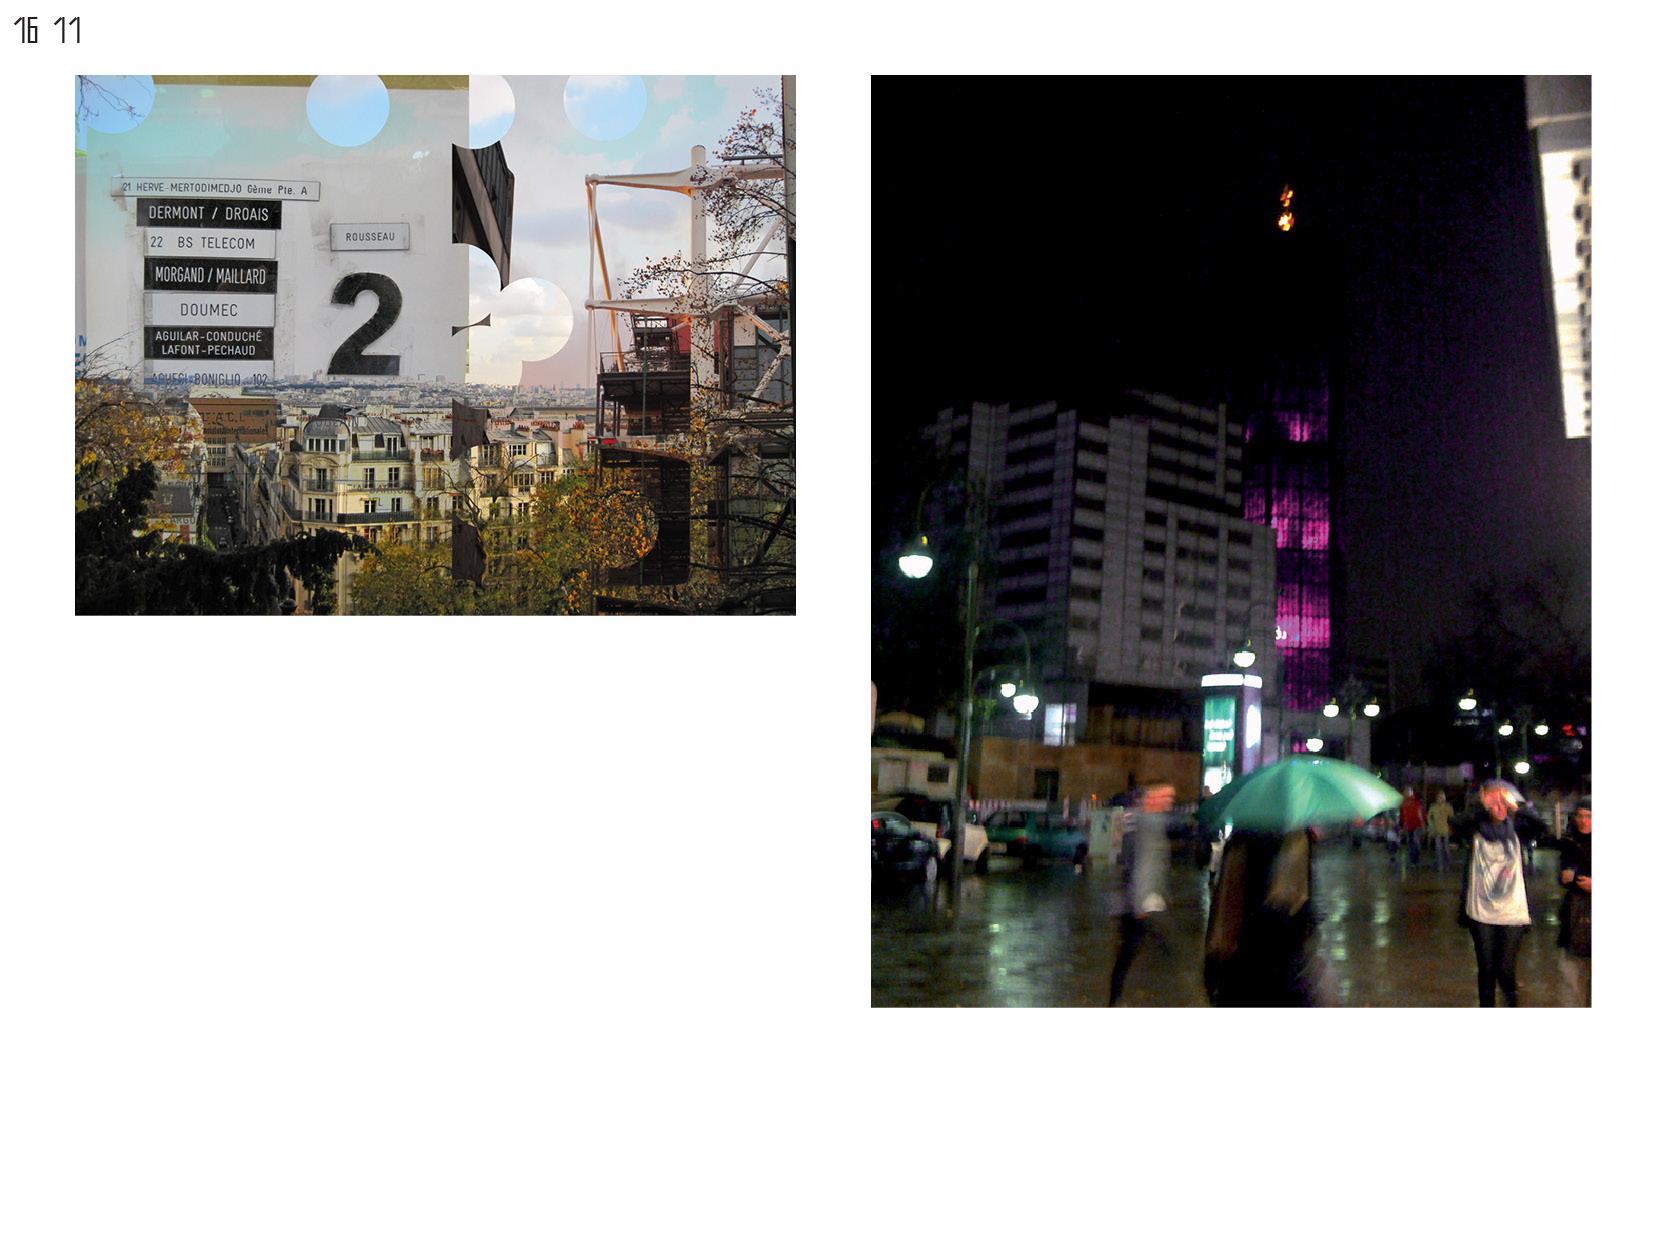 Gerrit-Schweiger-Dialog-Städte-Paris-Berlin-Jessica-Blank-Experiment-Fotoserie-Tagebuch-visuelle-Kommunikation-31